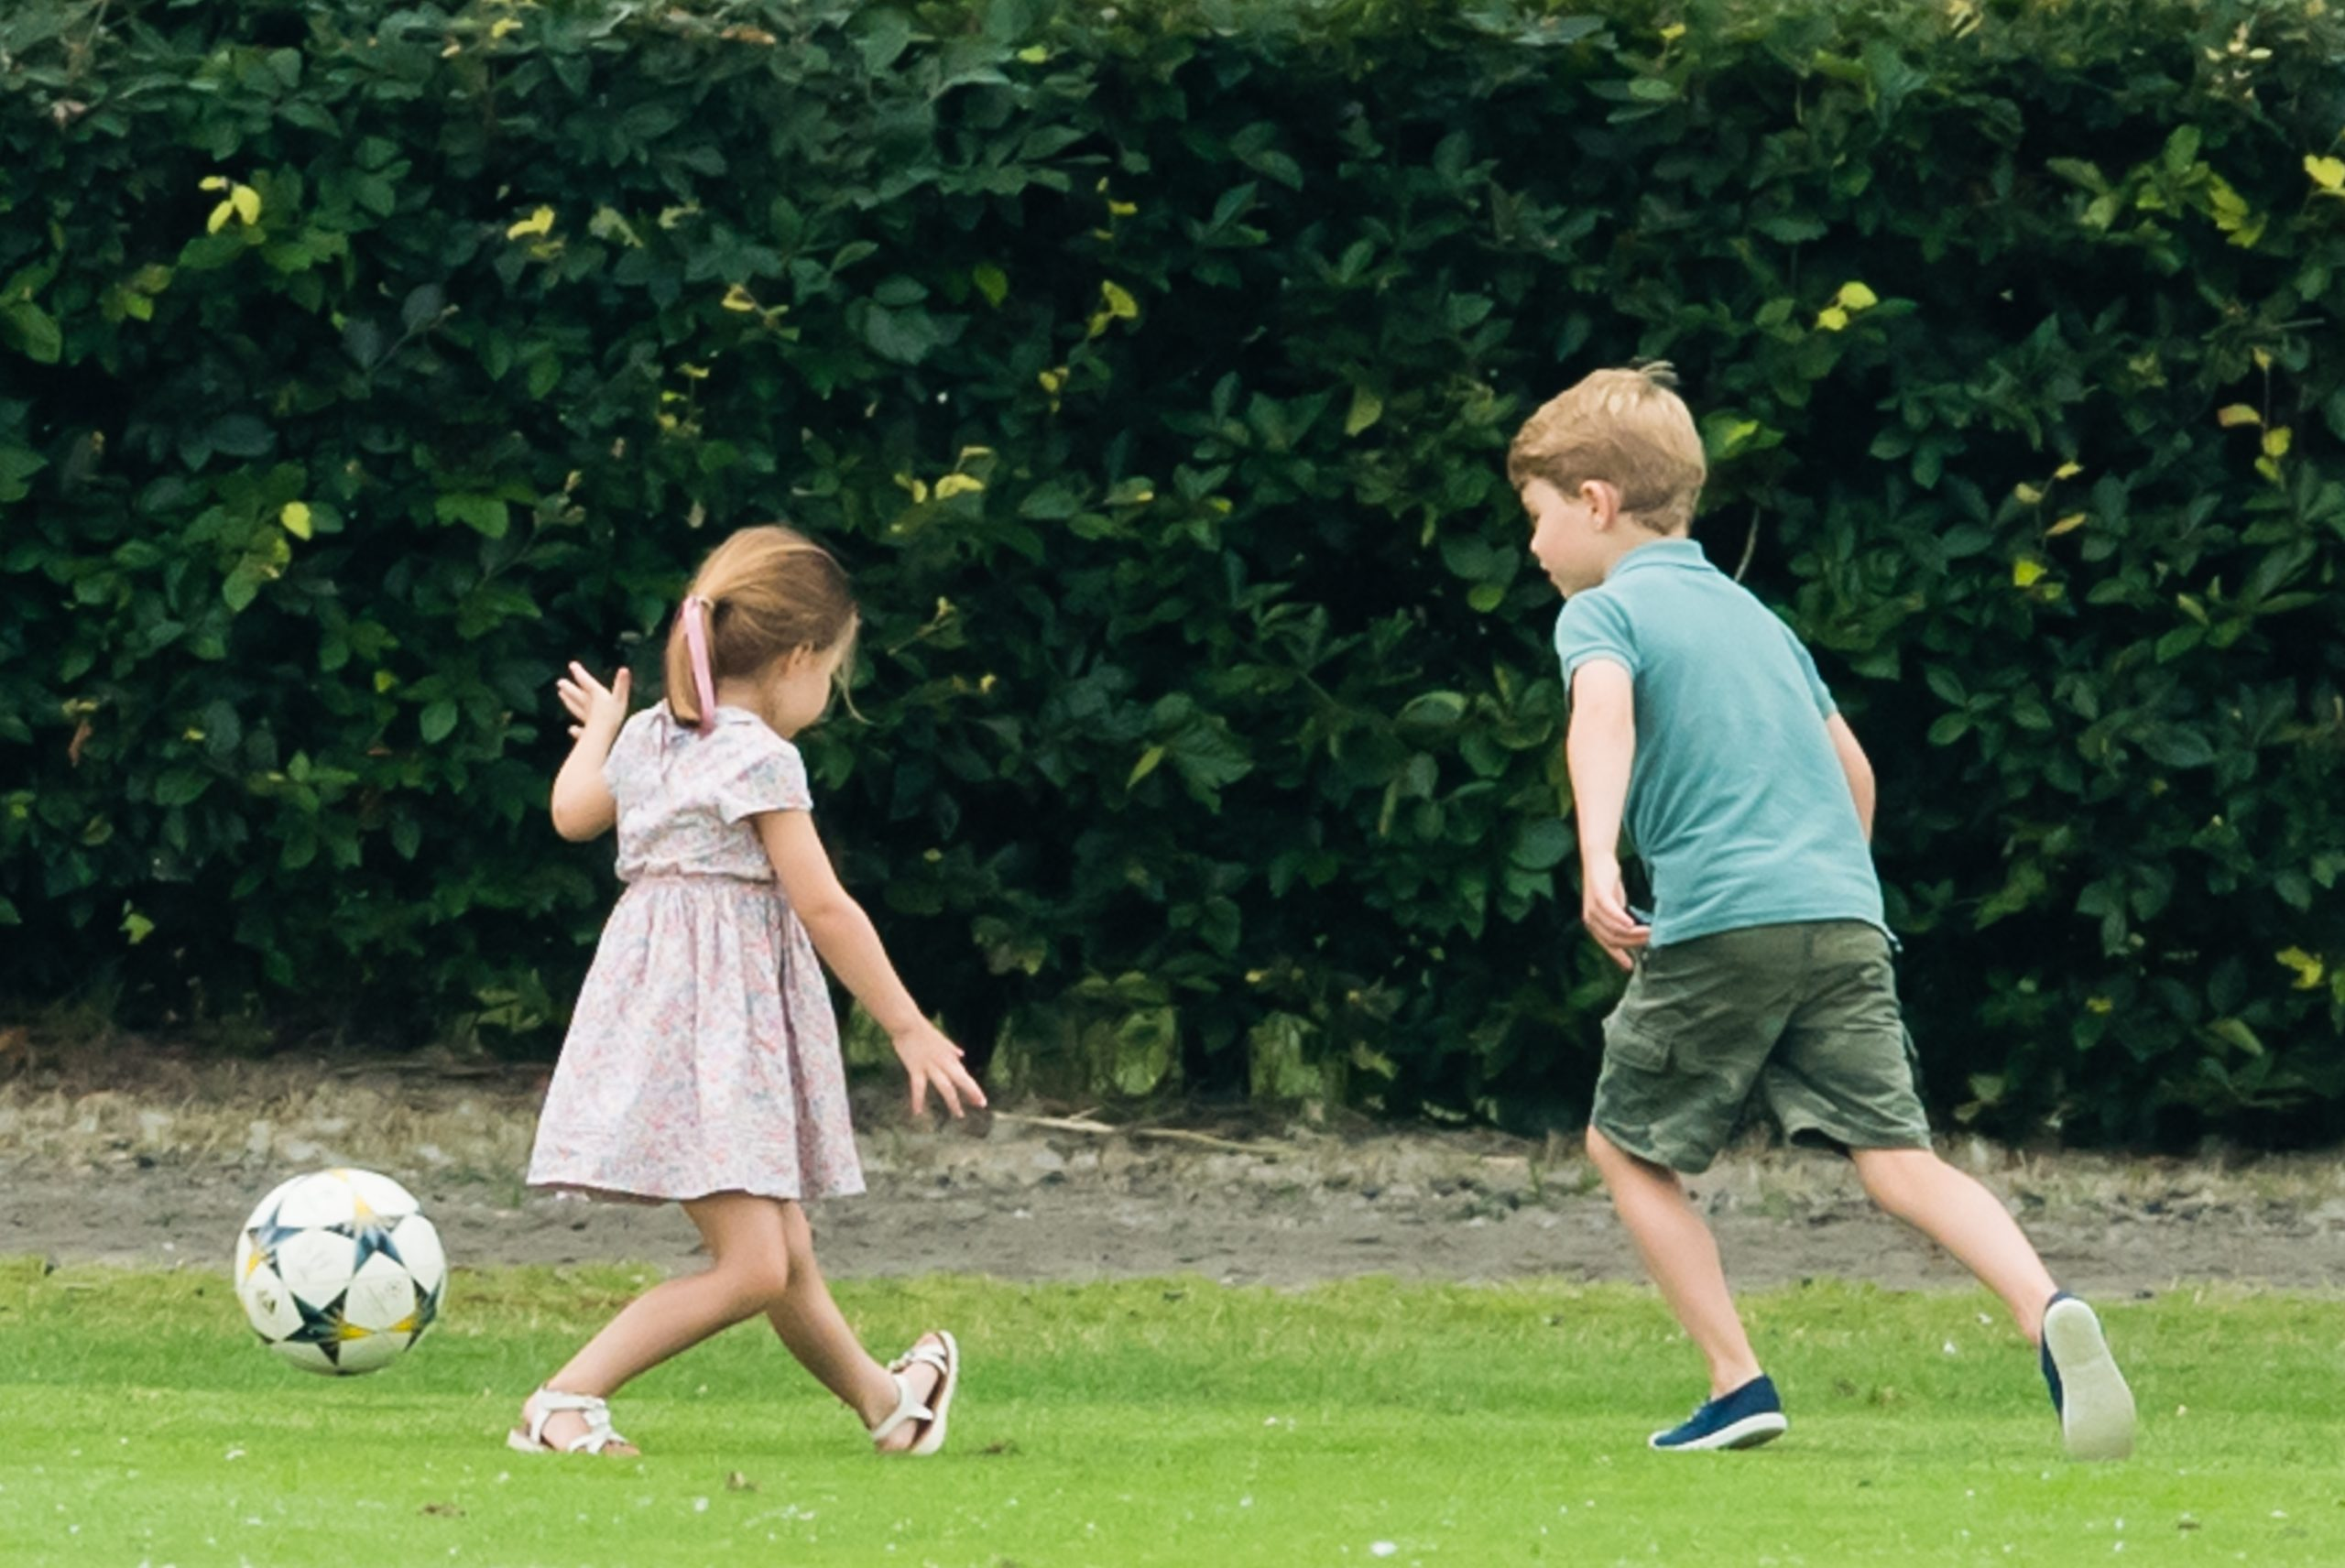 Le Prince George et la Princesse Charlotte jouant au football